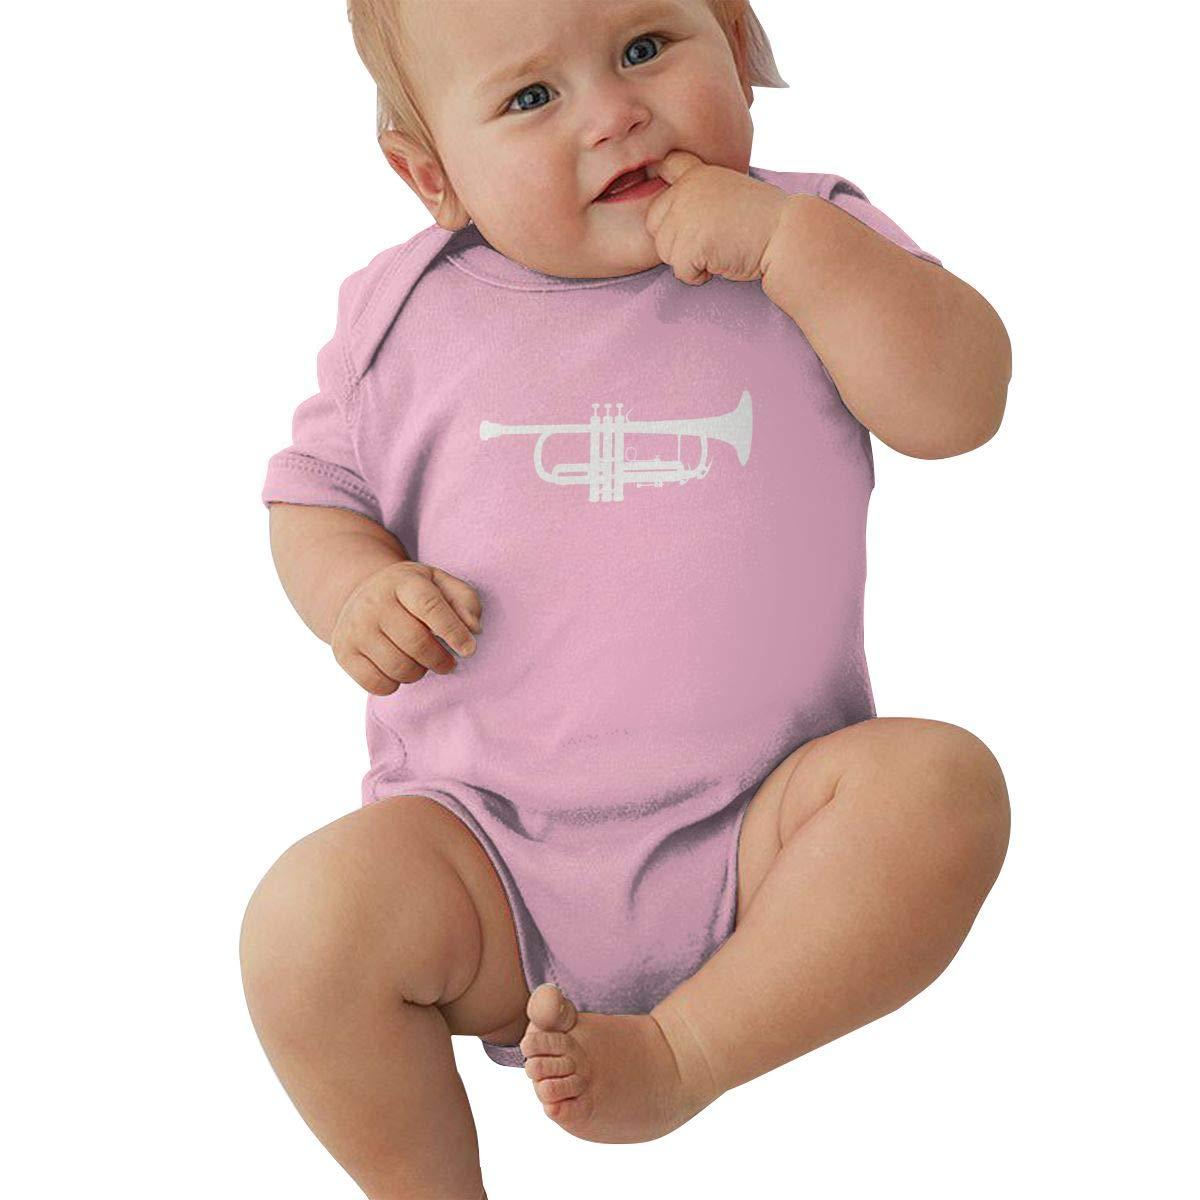 Trumpet32 Toddler Baby Girl Boy Bodysuit Jumpsuit Short Sleeved Bodysuit Tops Clothes